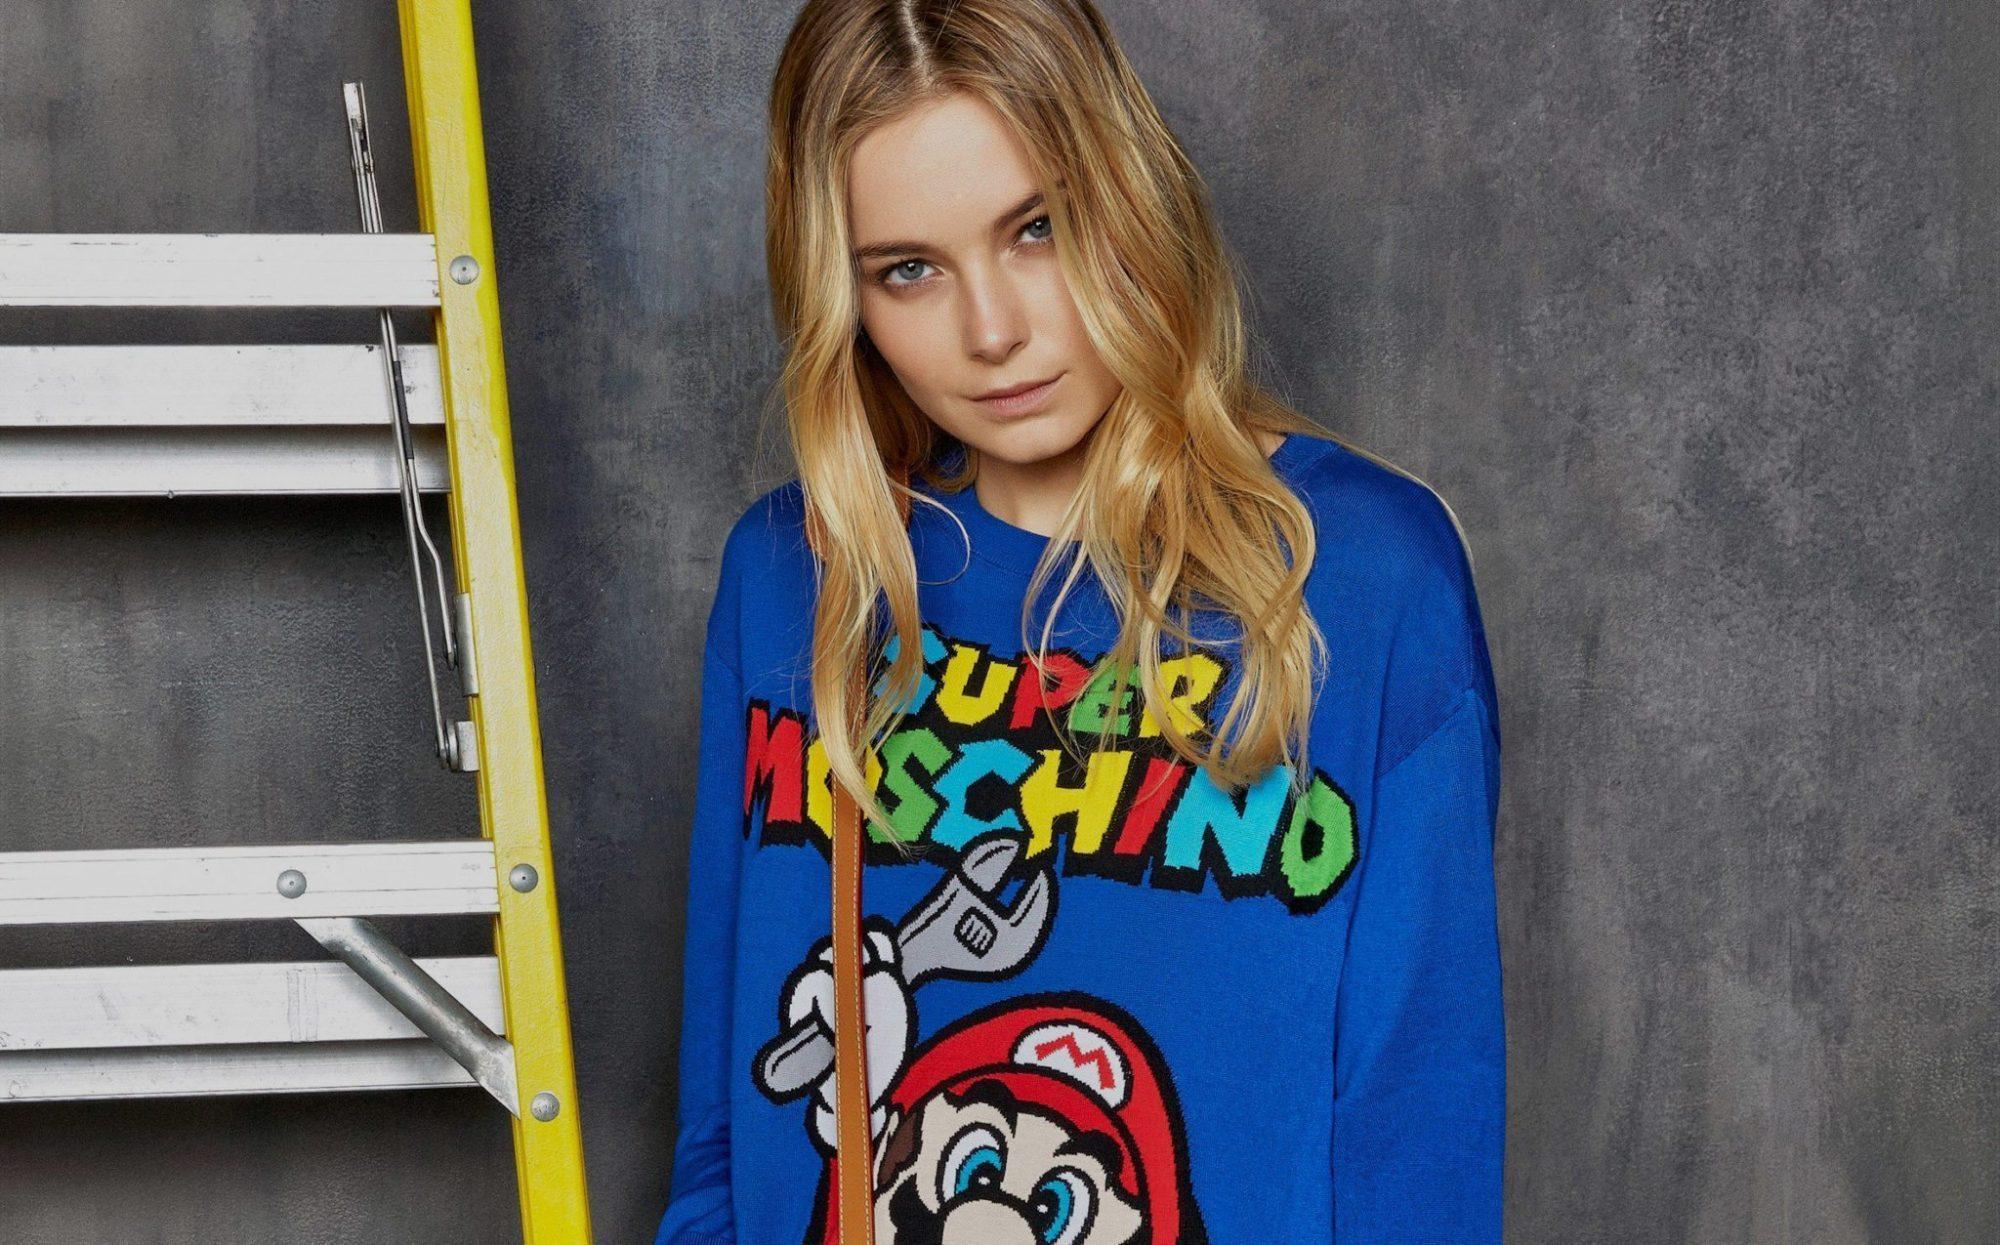 MOSCHINO 'SUPER MOSCHINO' COLLECTION WITH NINTENDO